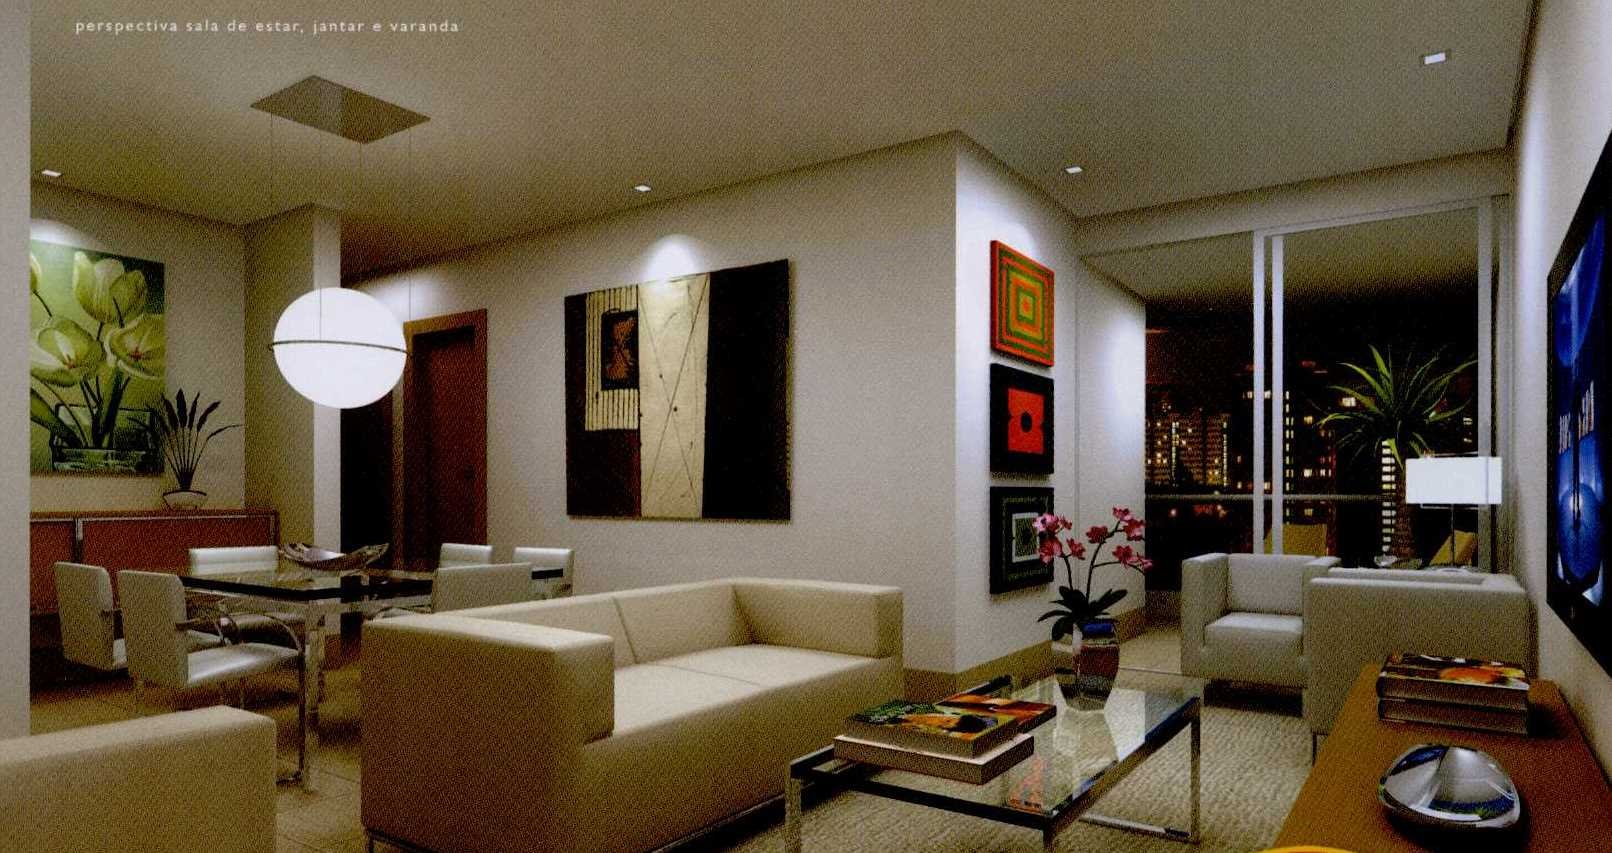 Decorando a sala for Decoracion ambientes